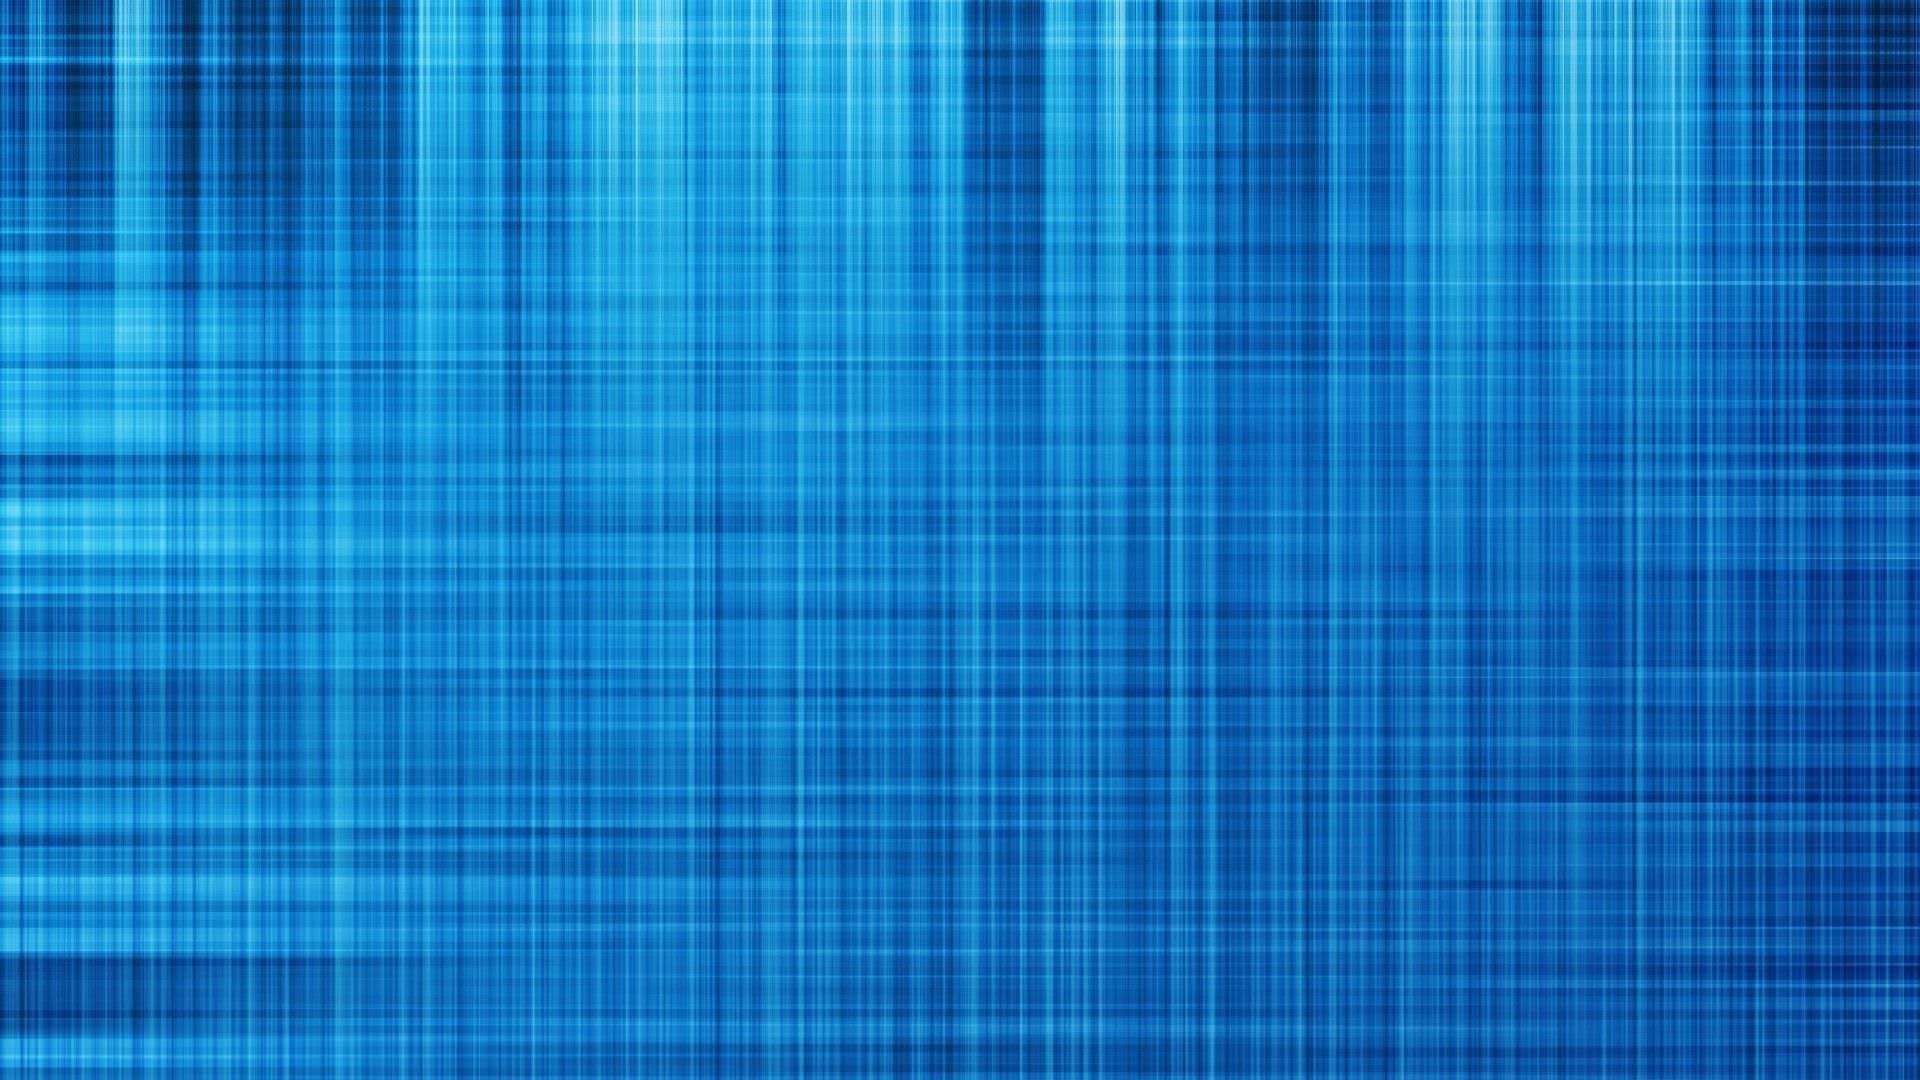 Blue Texture background ·① Download free stunning High Resolution ...